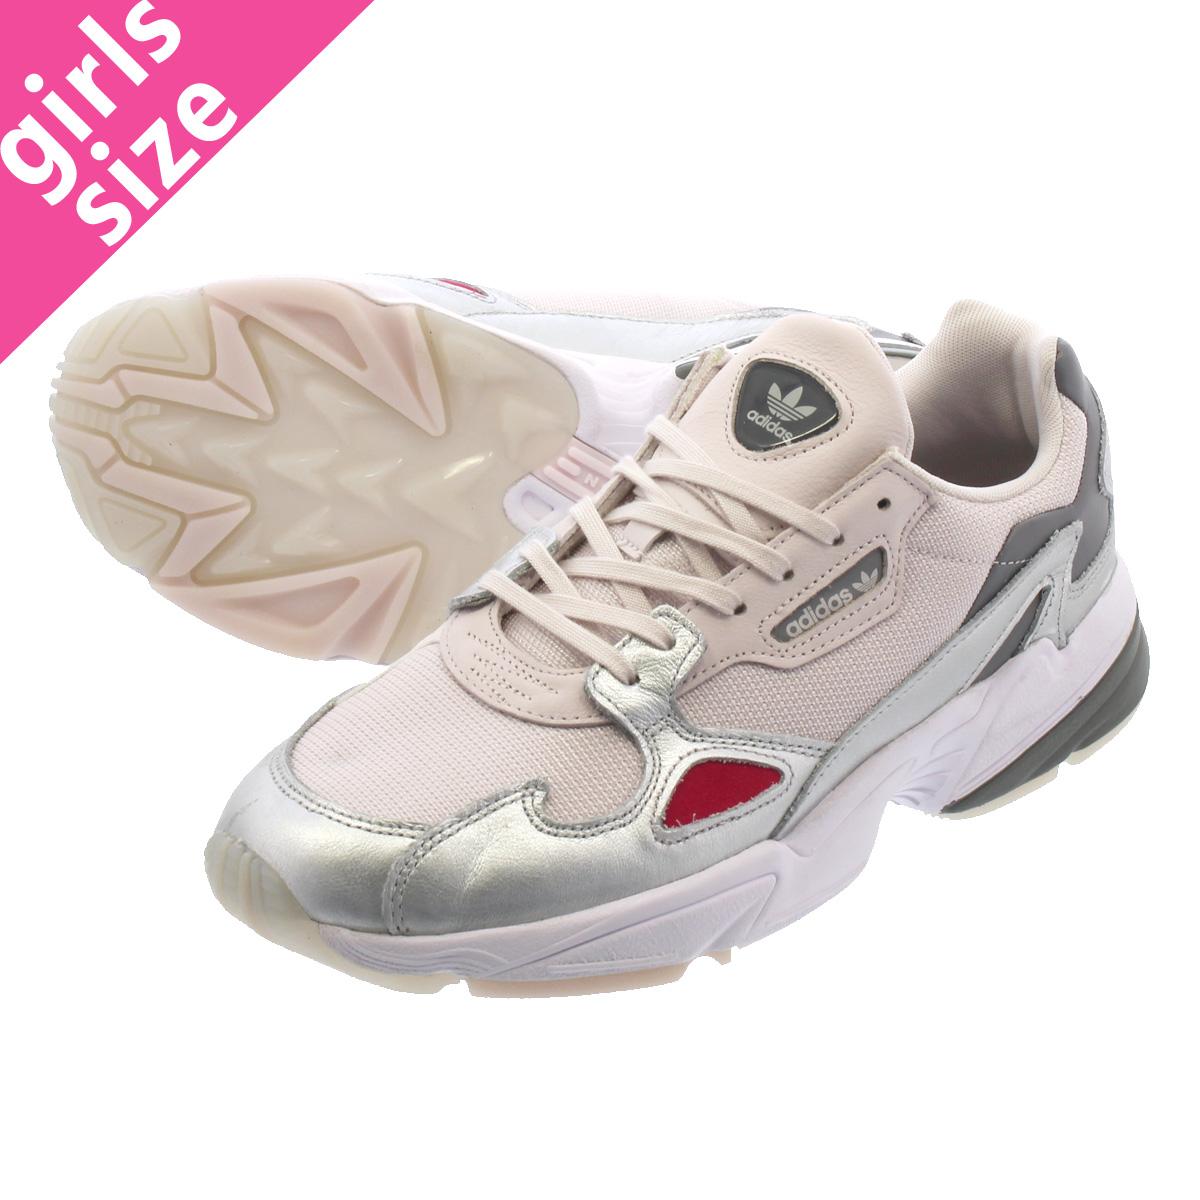 promo code 5183f ef735 LOWTEX PLUS adidas ADIDASFALCON W LL Adidas Adidas falcon women LL ORCHID  TINTORCHID TINTSILVER MET d96757  Rakuten Global Market